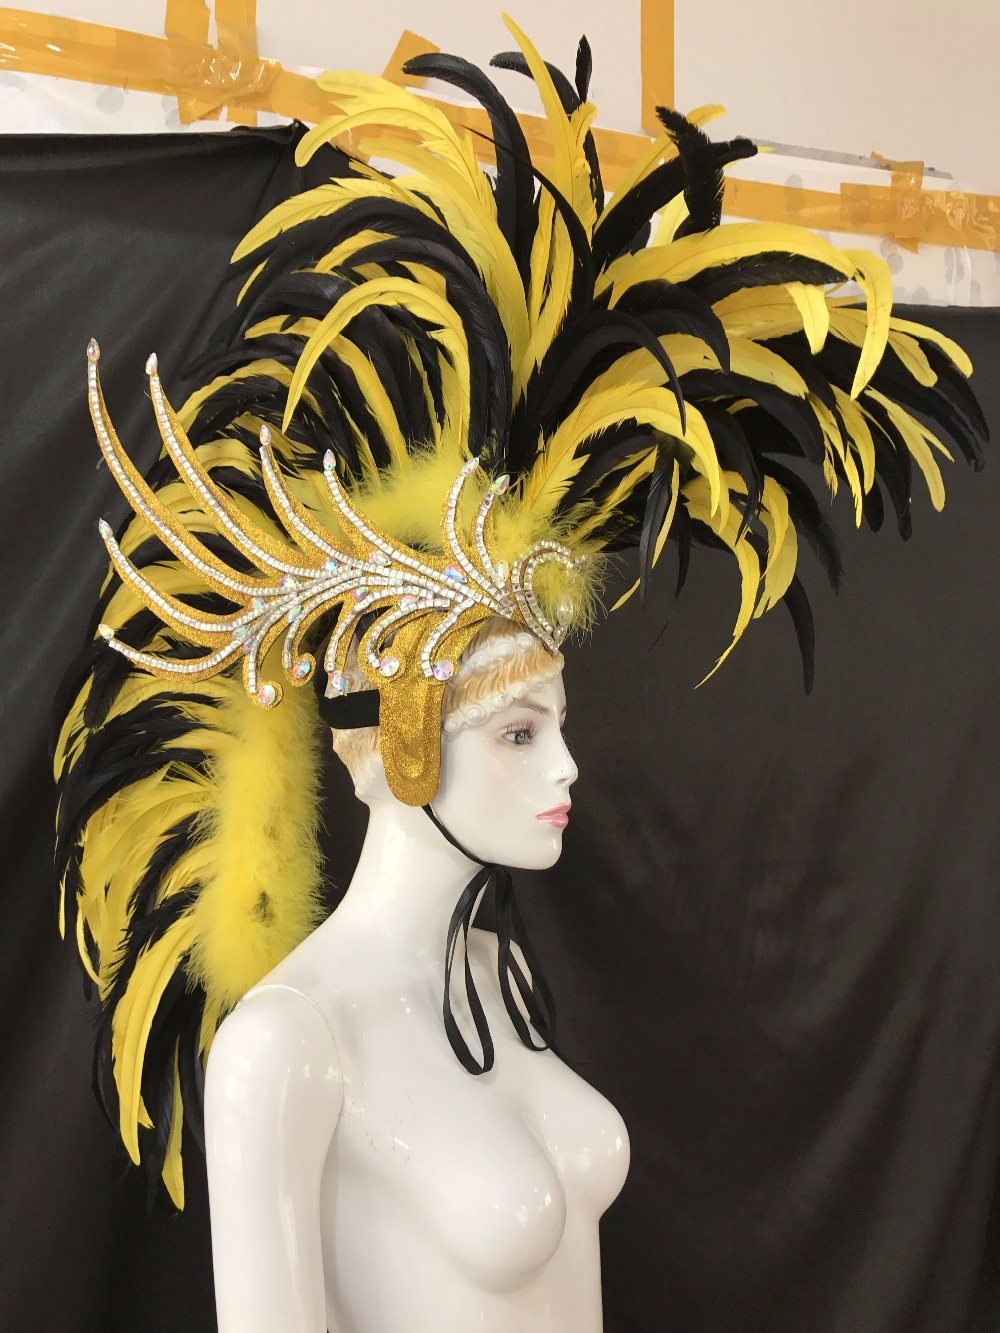 Image 4 - إذا كنت ترغب في الحصول على نسخة مجانية من مهرجان abbigliamento La FESTA La Maschera ILaccessories blackberryfestivalaccessories mp3 -